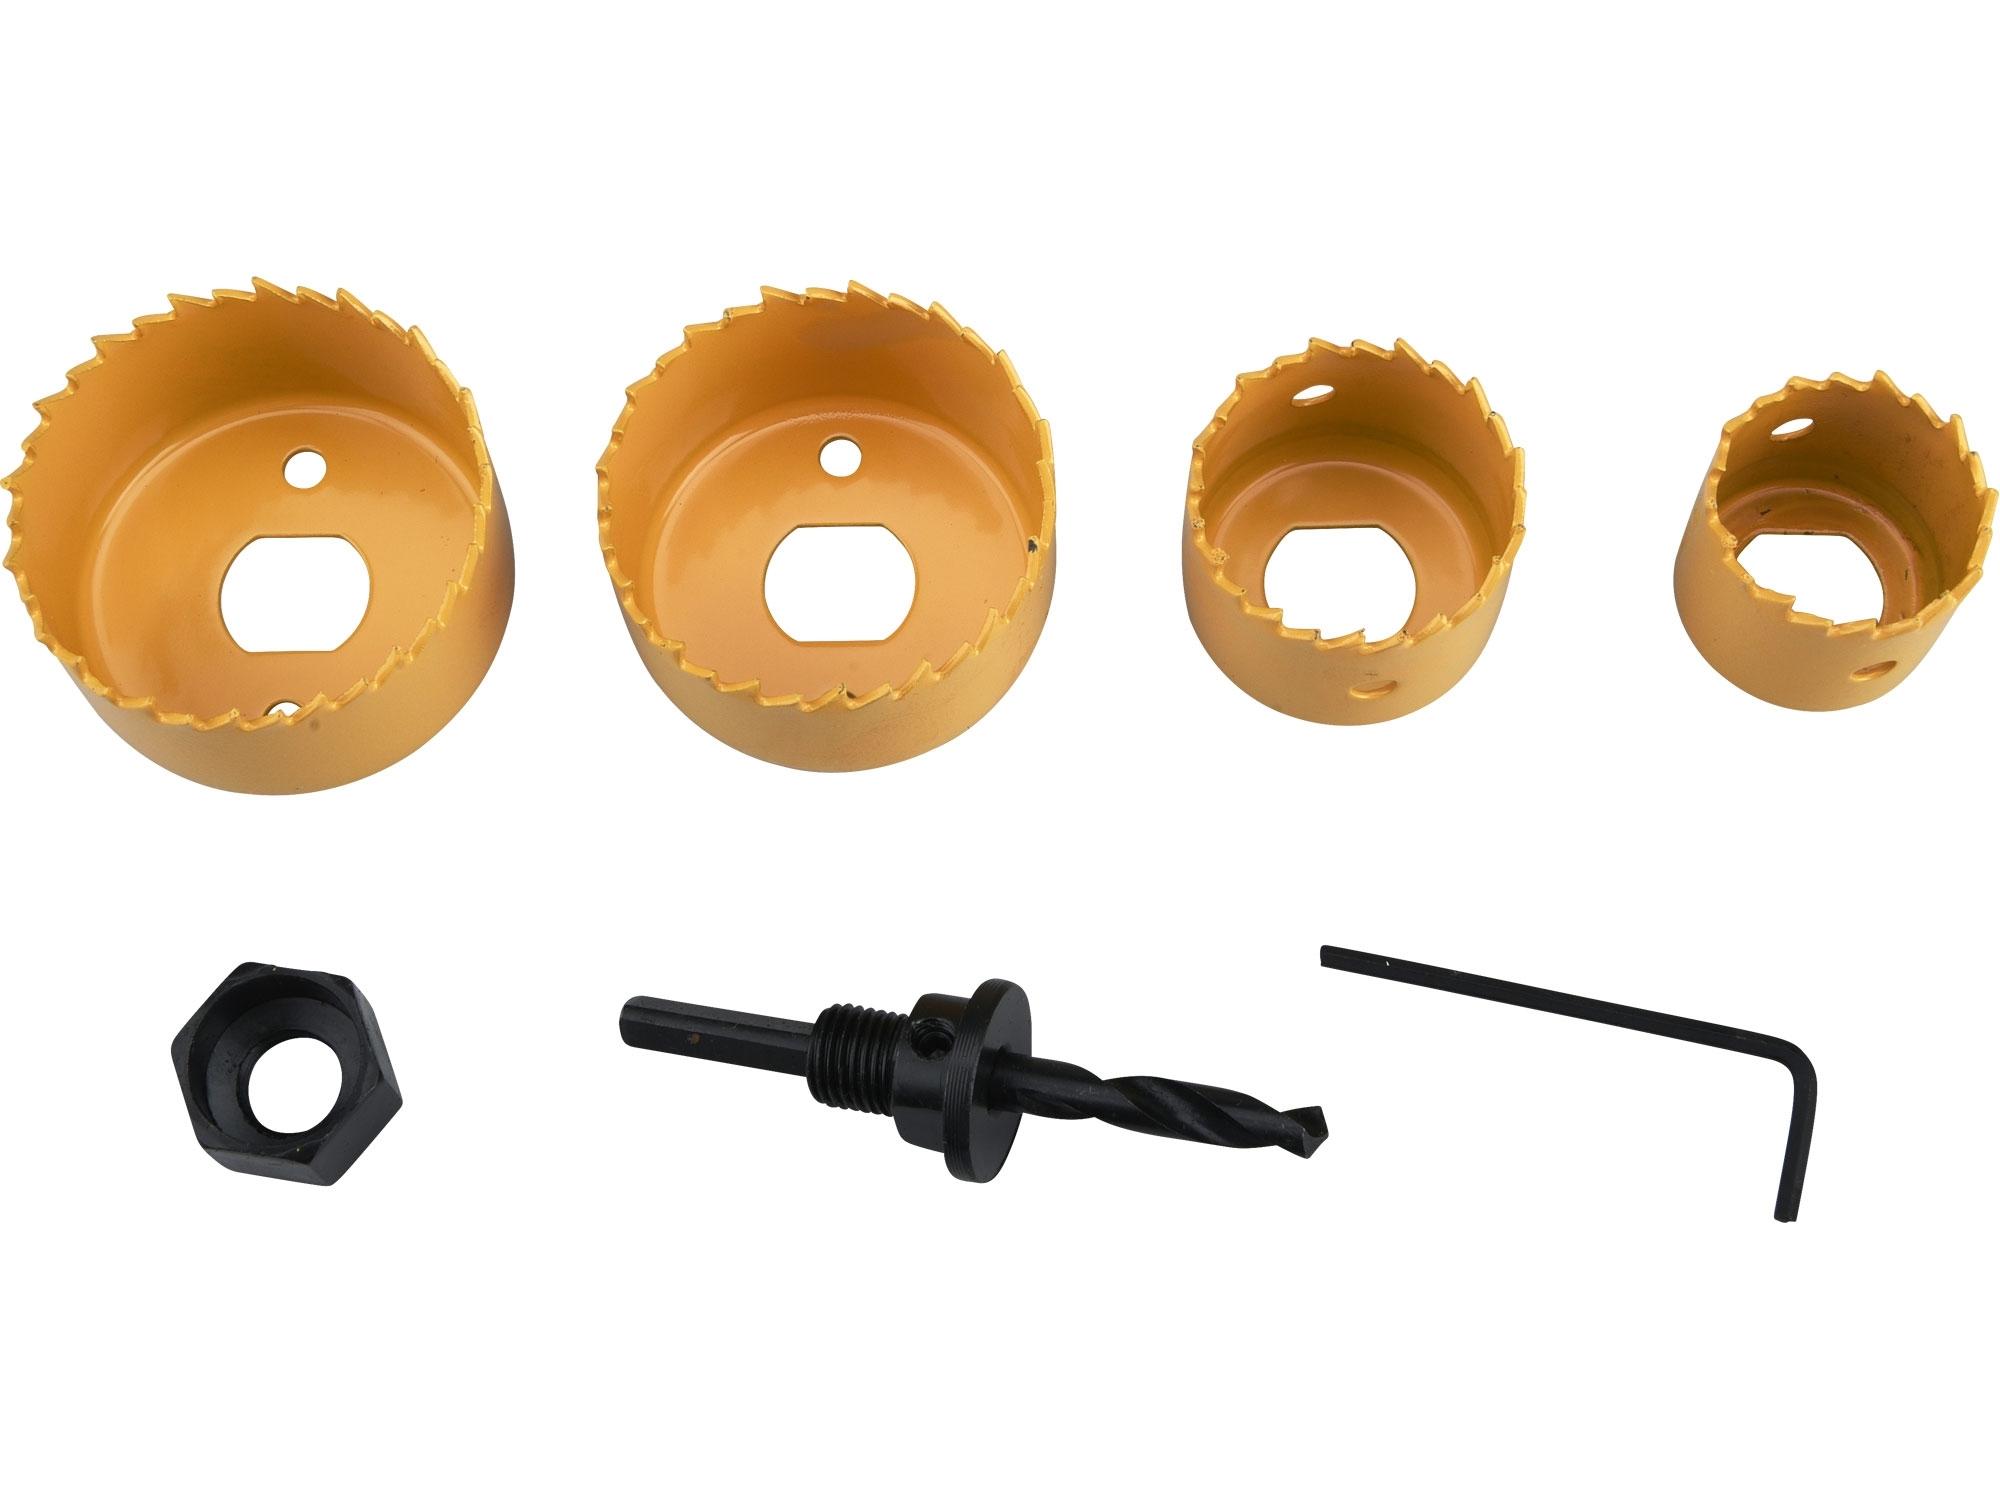 vrtáky vykružovací korunkové, sada 6ks, 4 průměry, HSS/Bi-metal, EXTOL CRAFT 1808